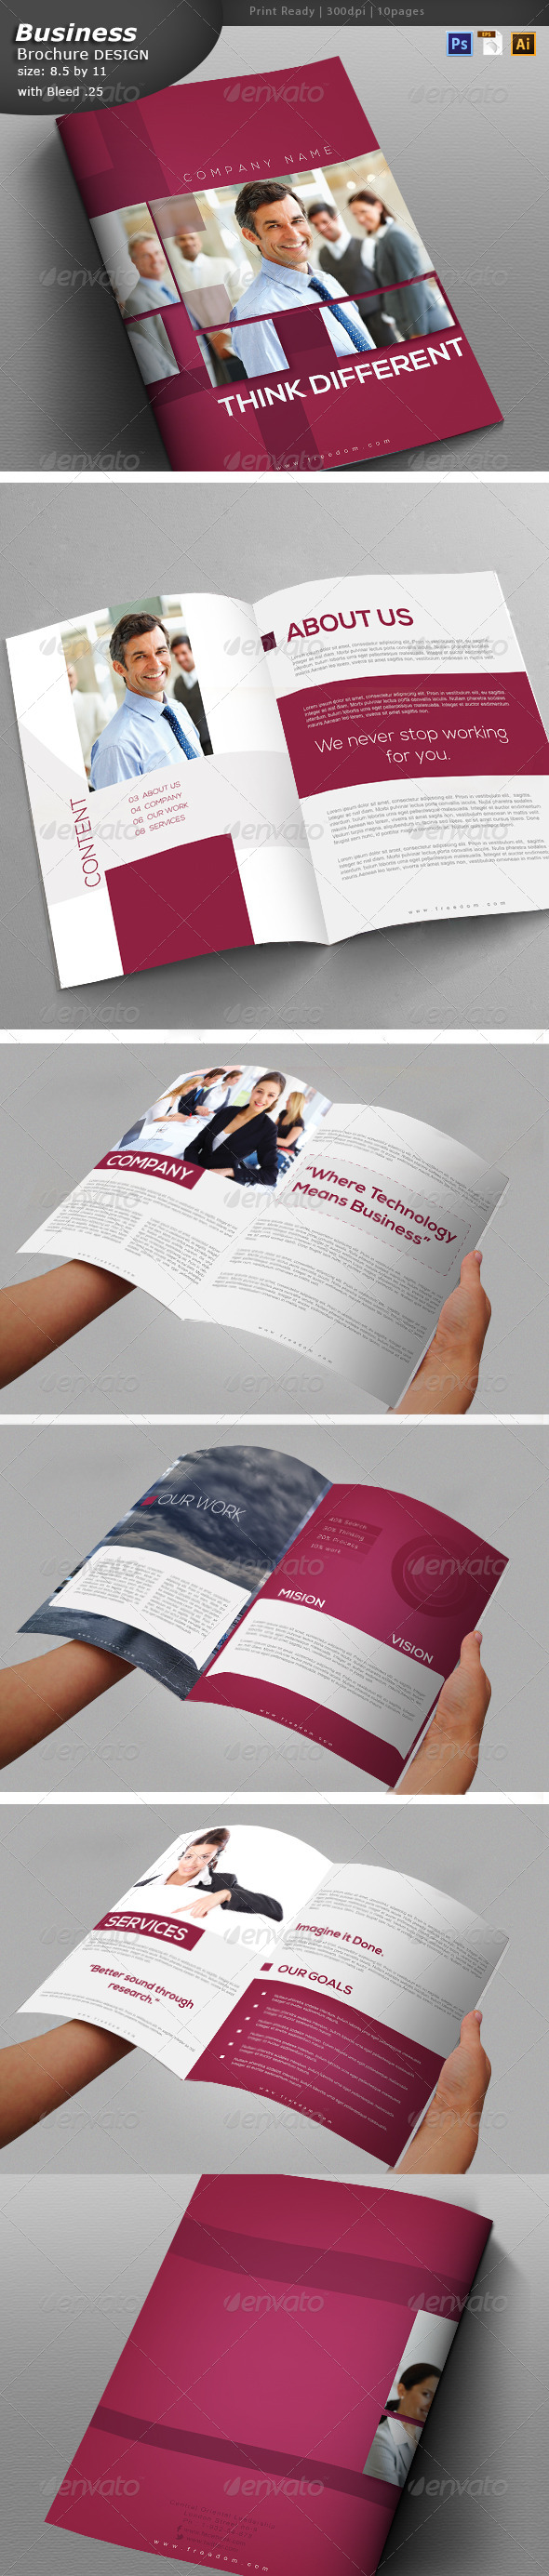 Services Brochure Design  - Brochures Print Templates